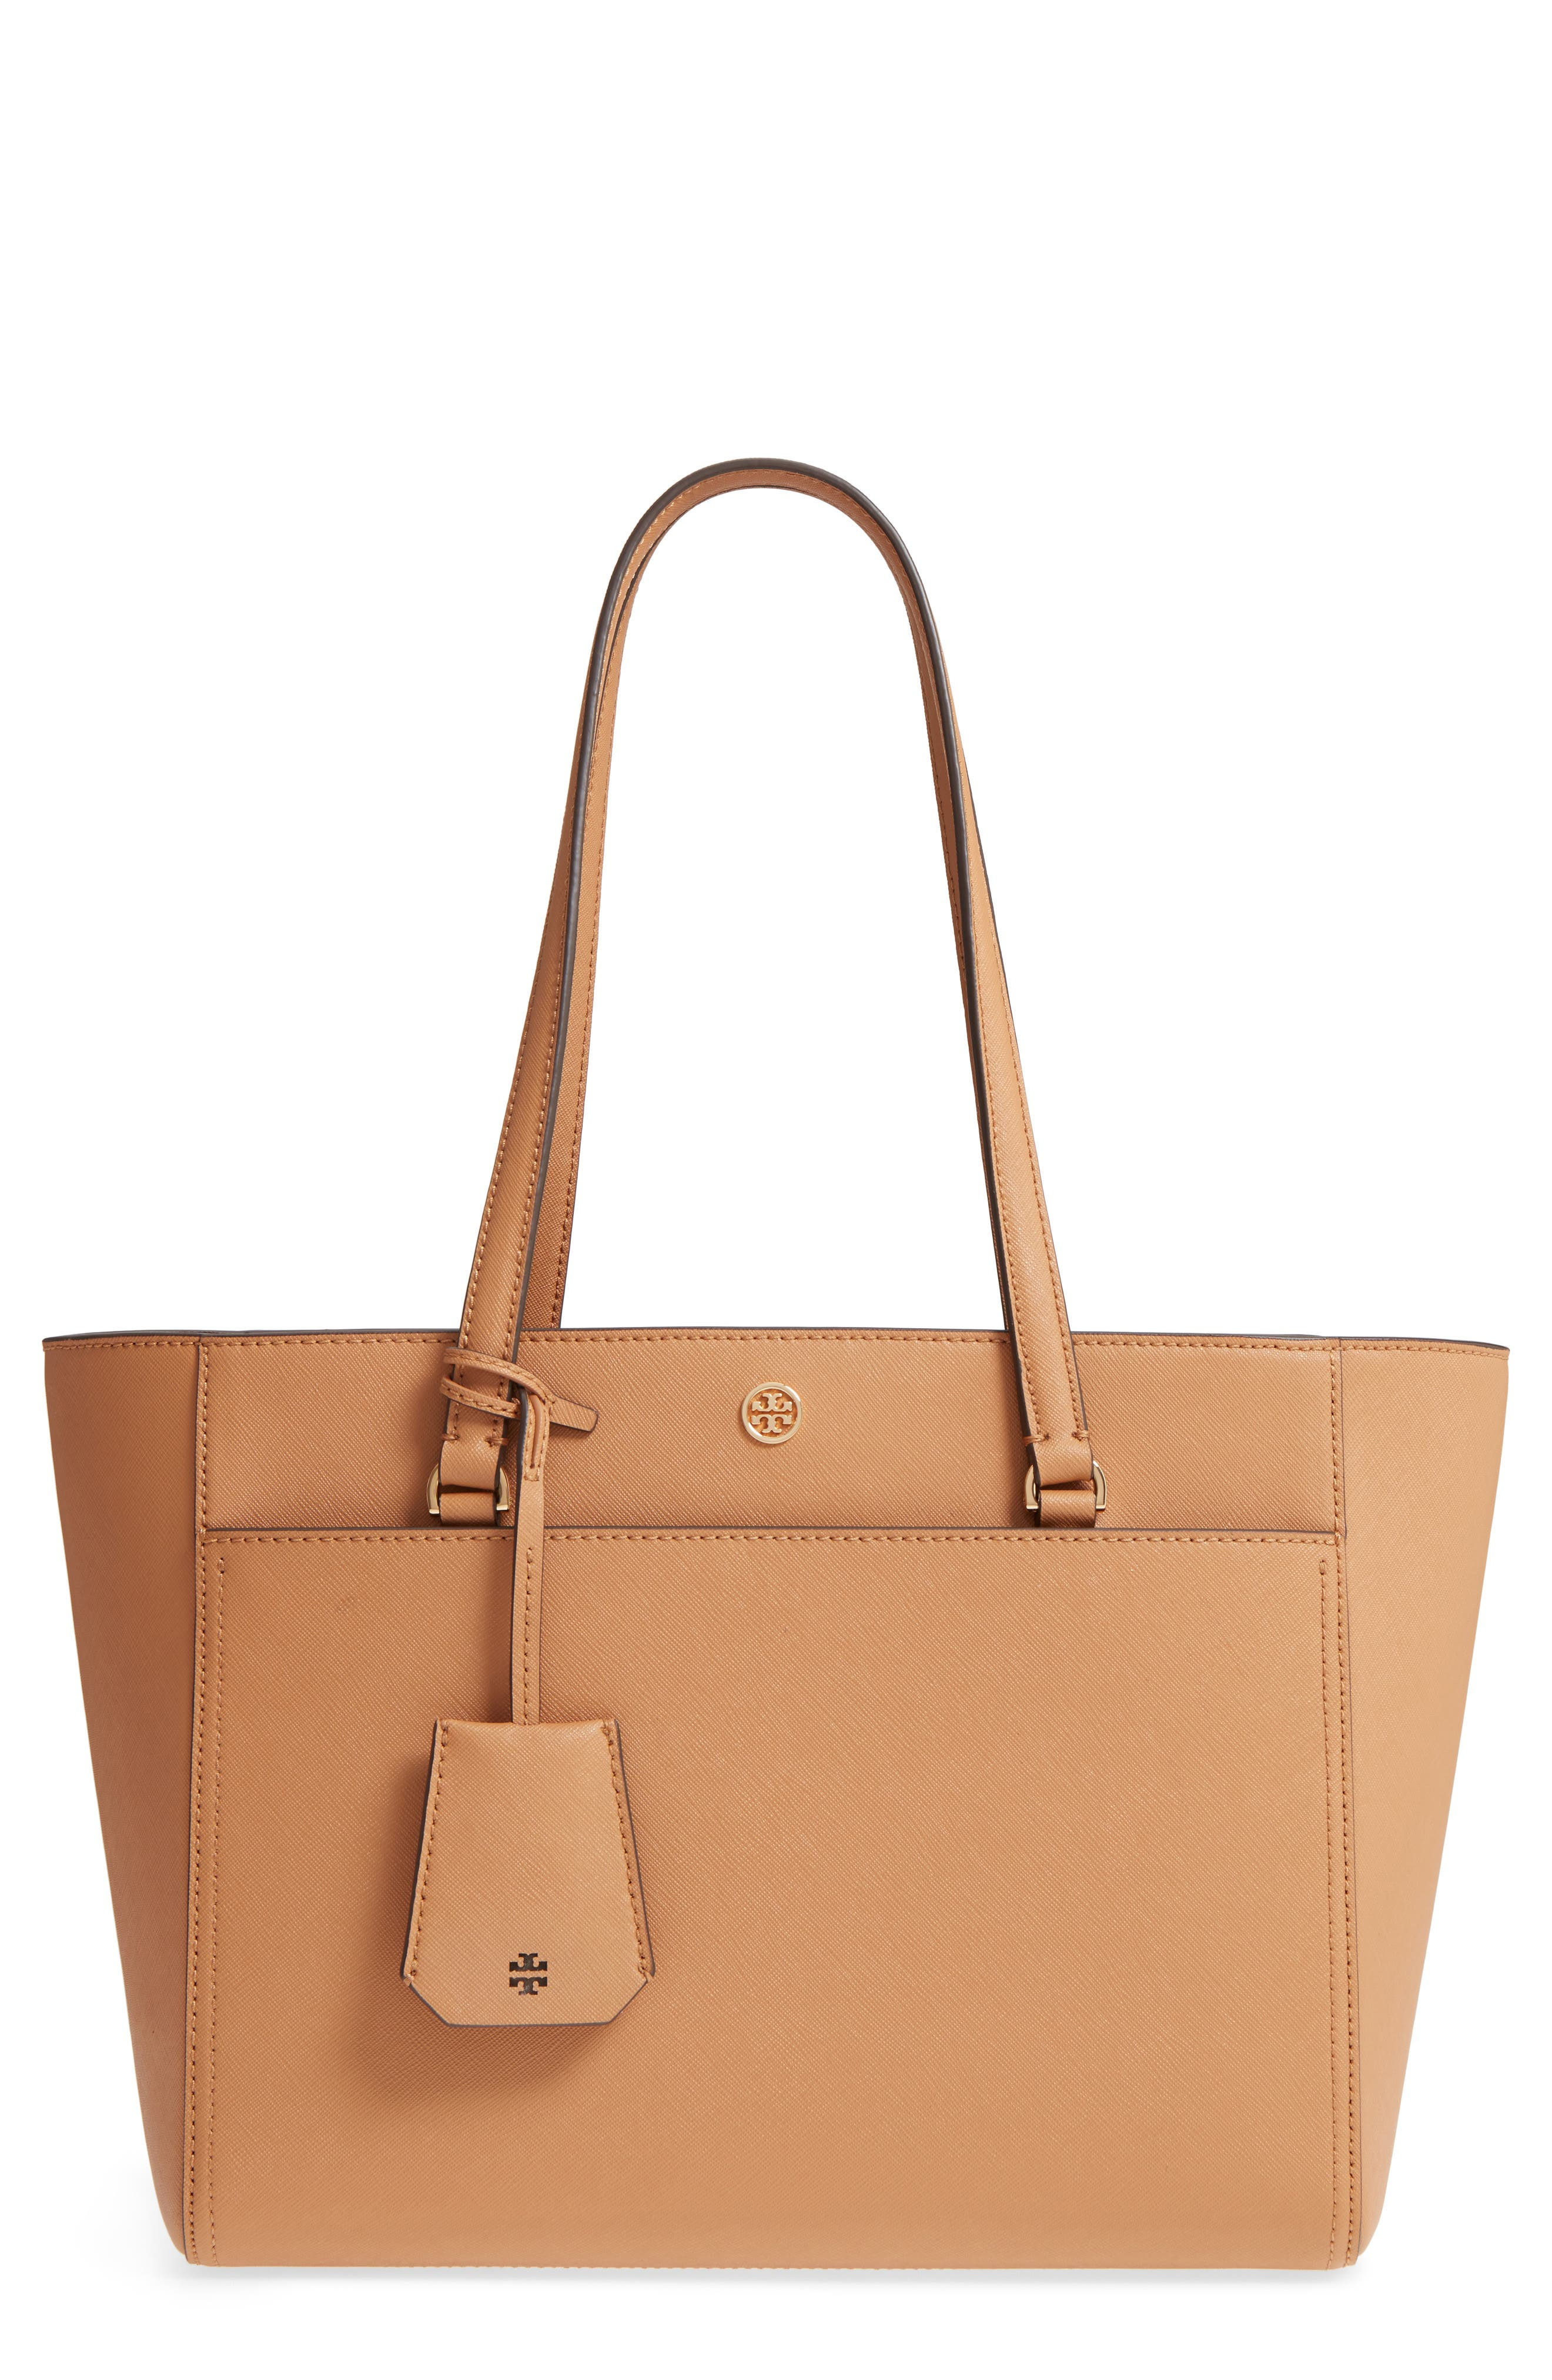 636f976fa Tory Burch Robinson Small Saffiano Leather Zip-Top Shoulder Tote Bag In  Cardamom / Royal